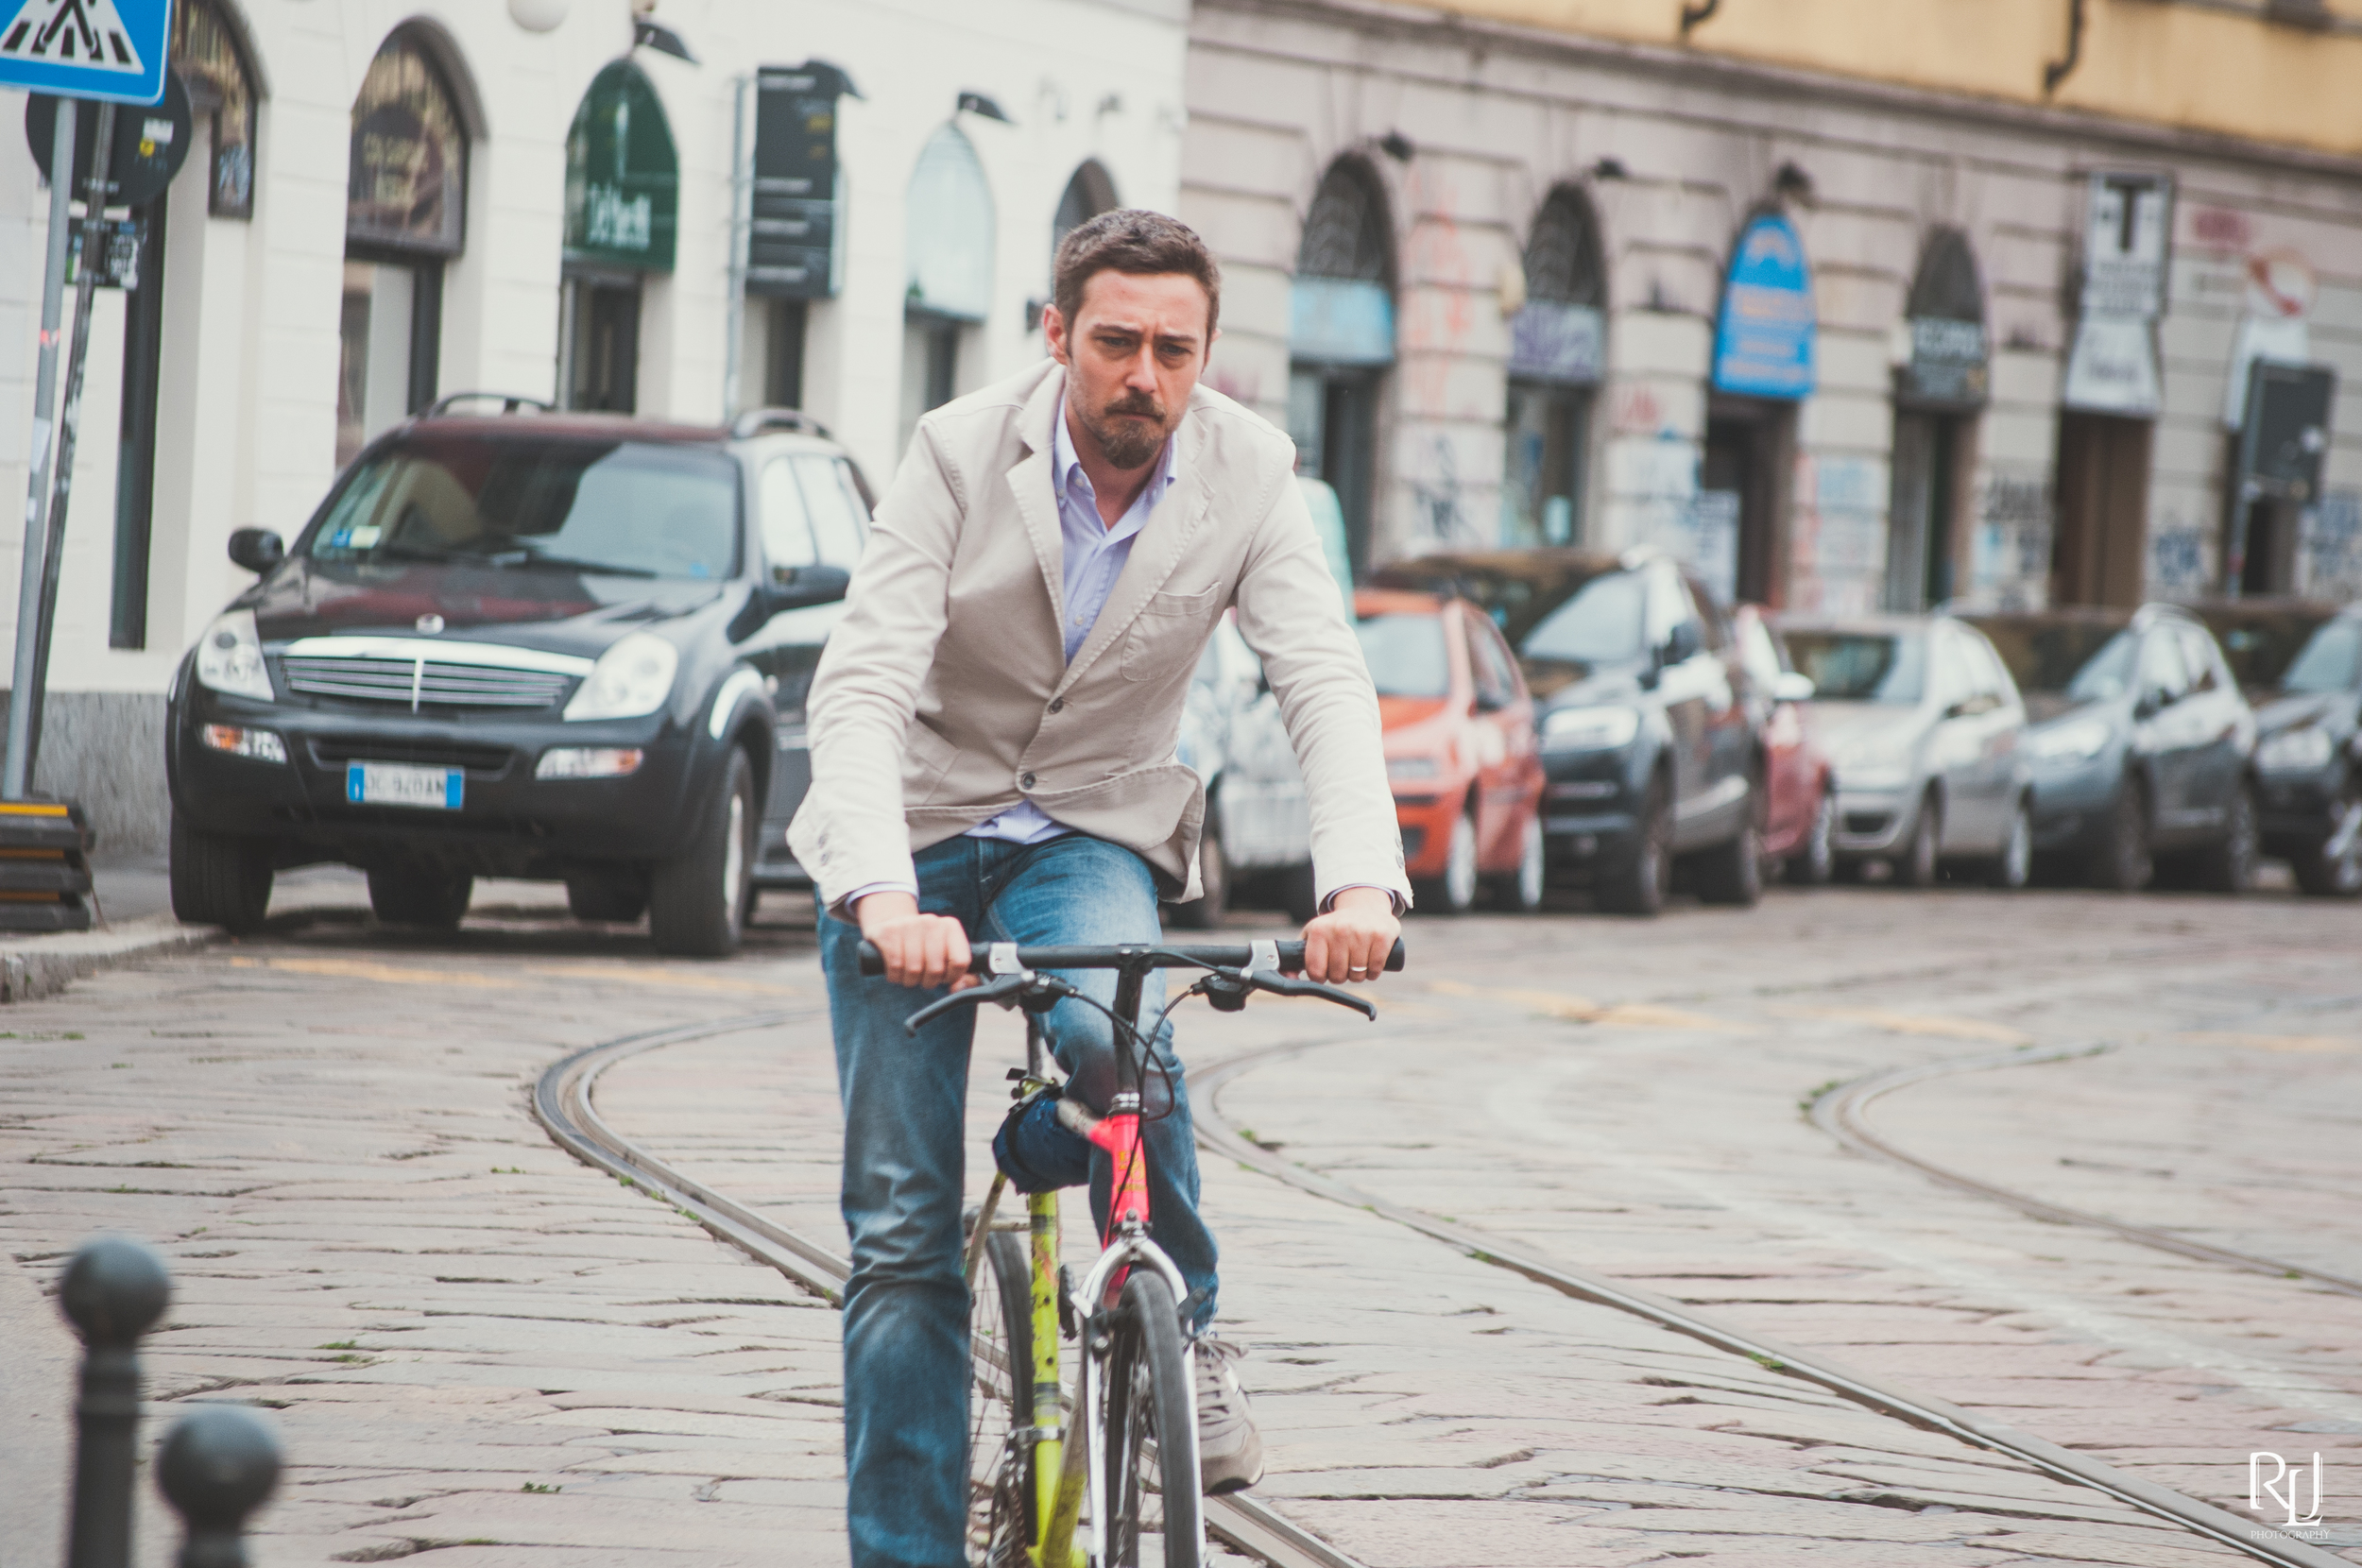 Milano2014-62.jpg